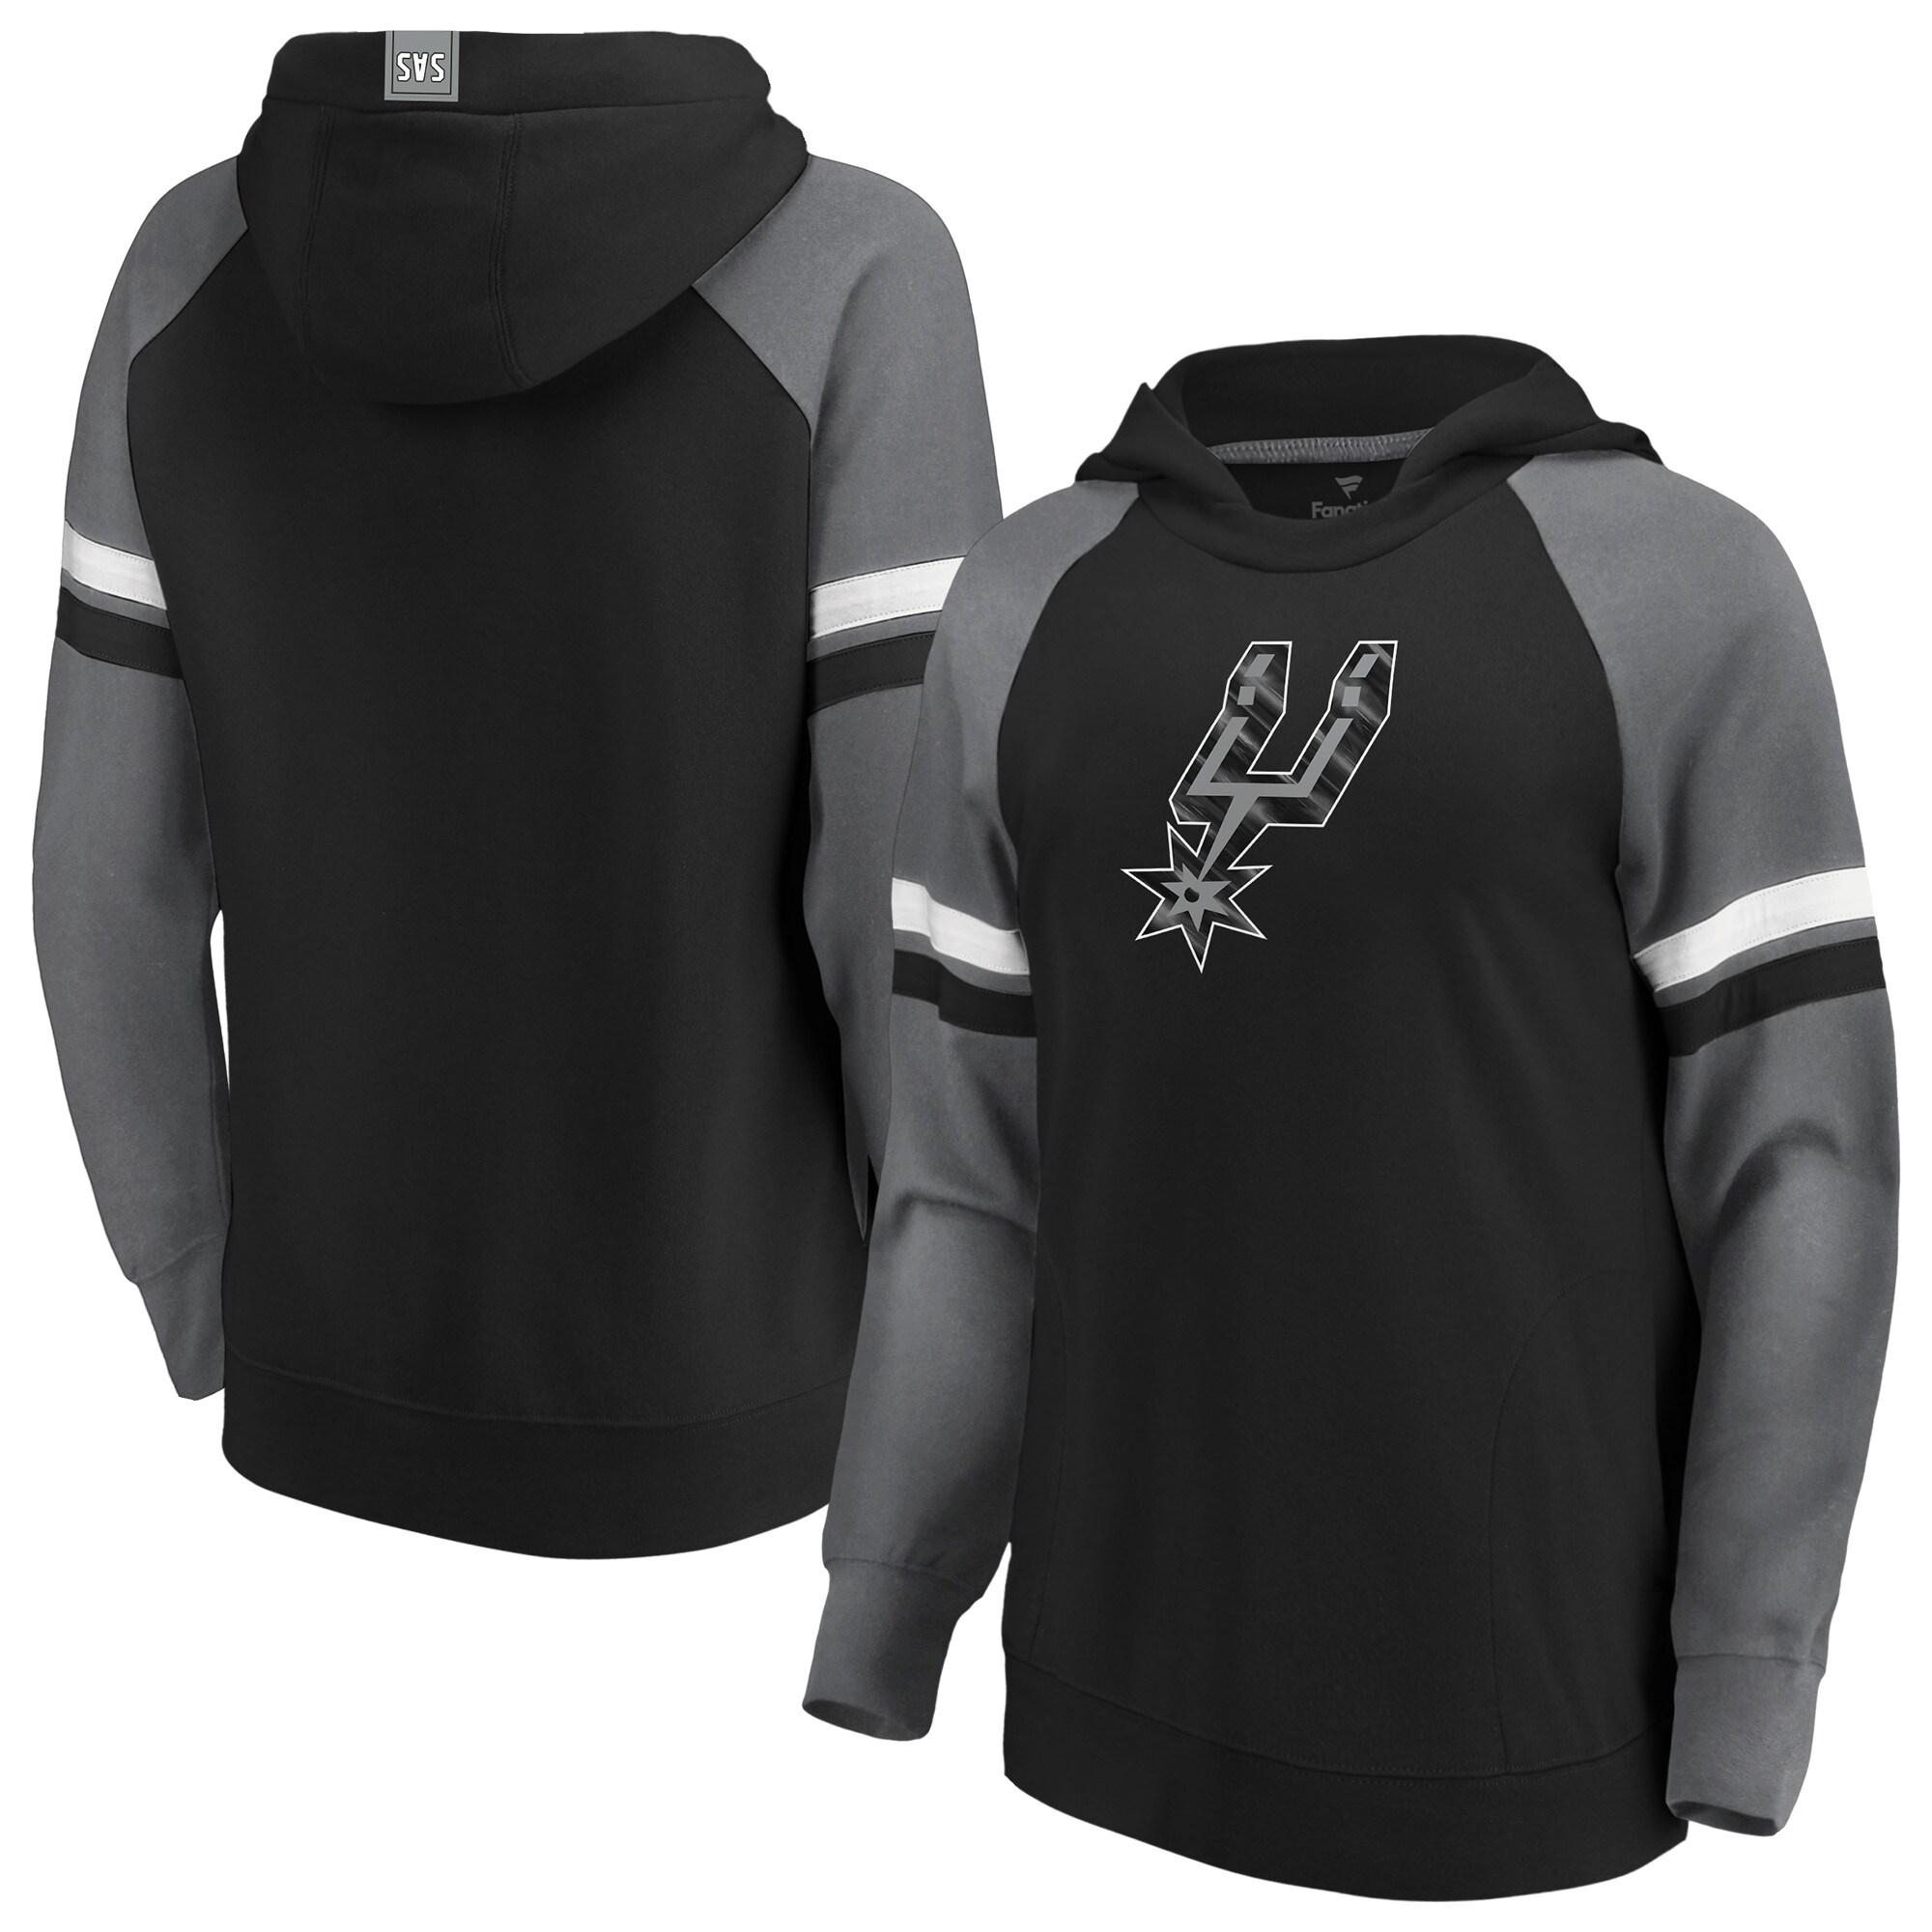 San Antonio Spurs Fanatics Branded Women's Iconic Best in Stock Pullover Hoodie - Black/Gray